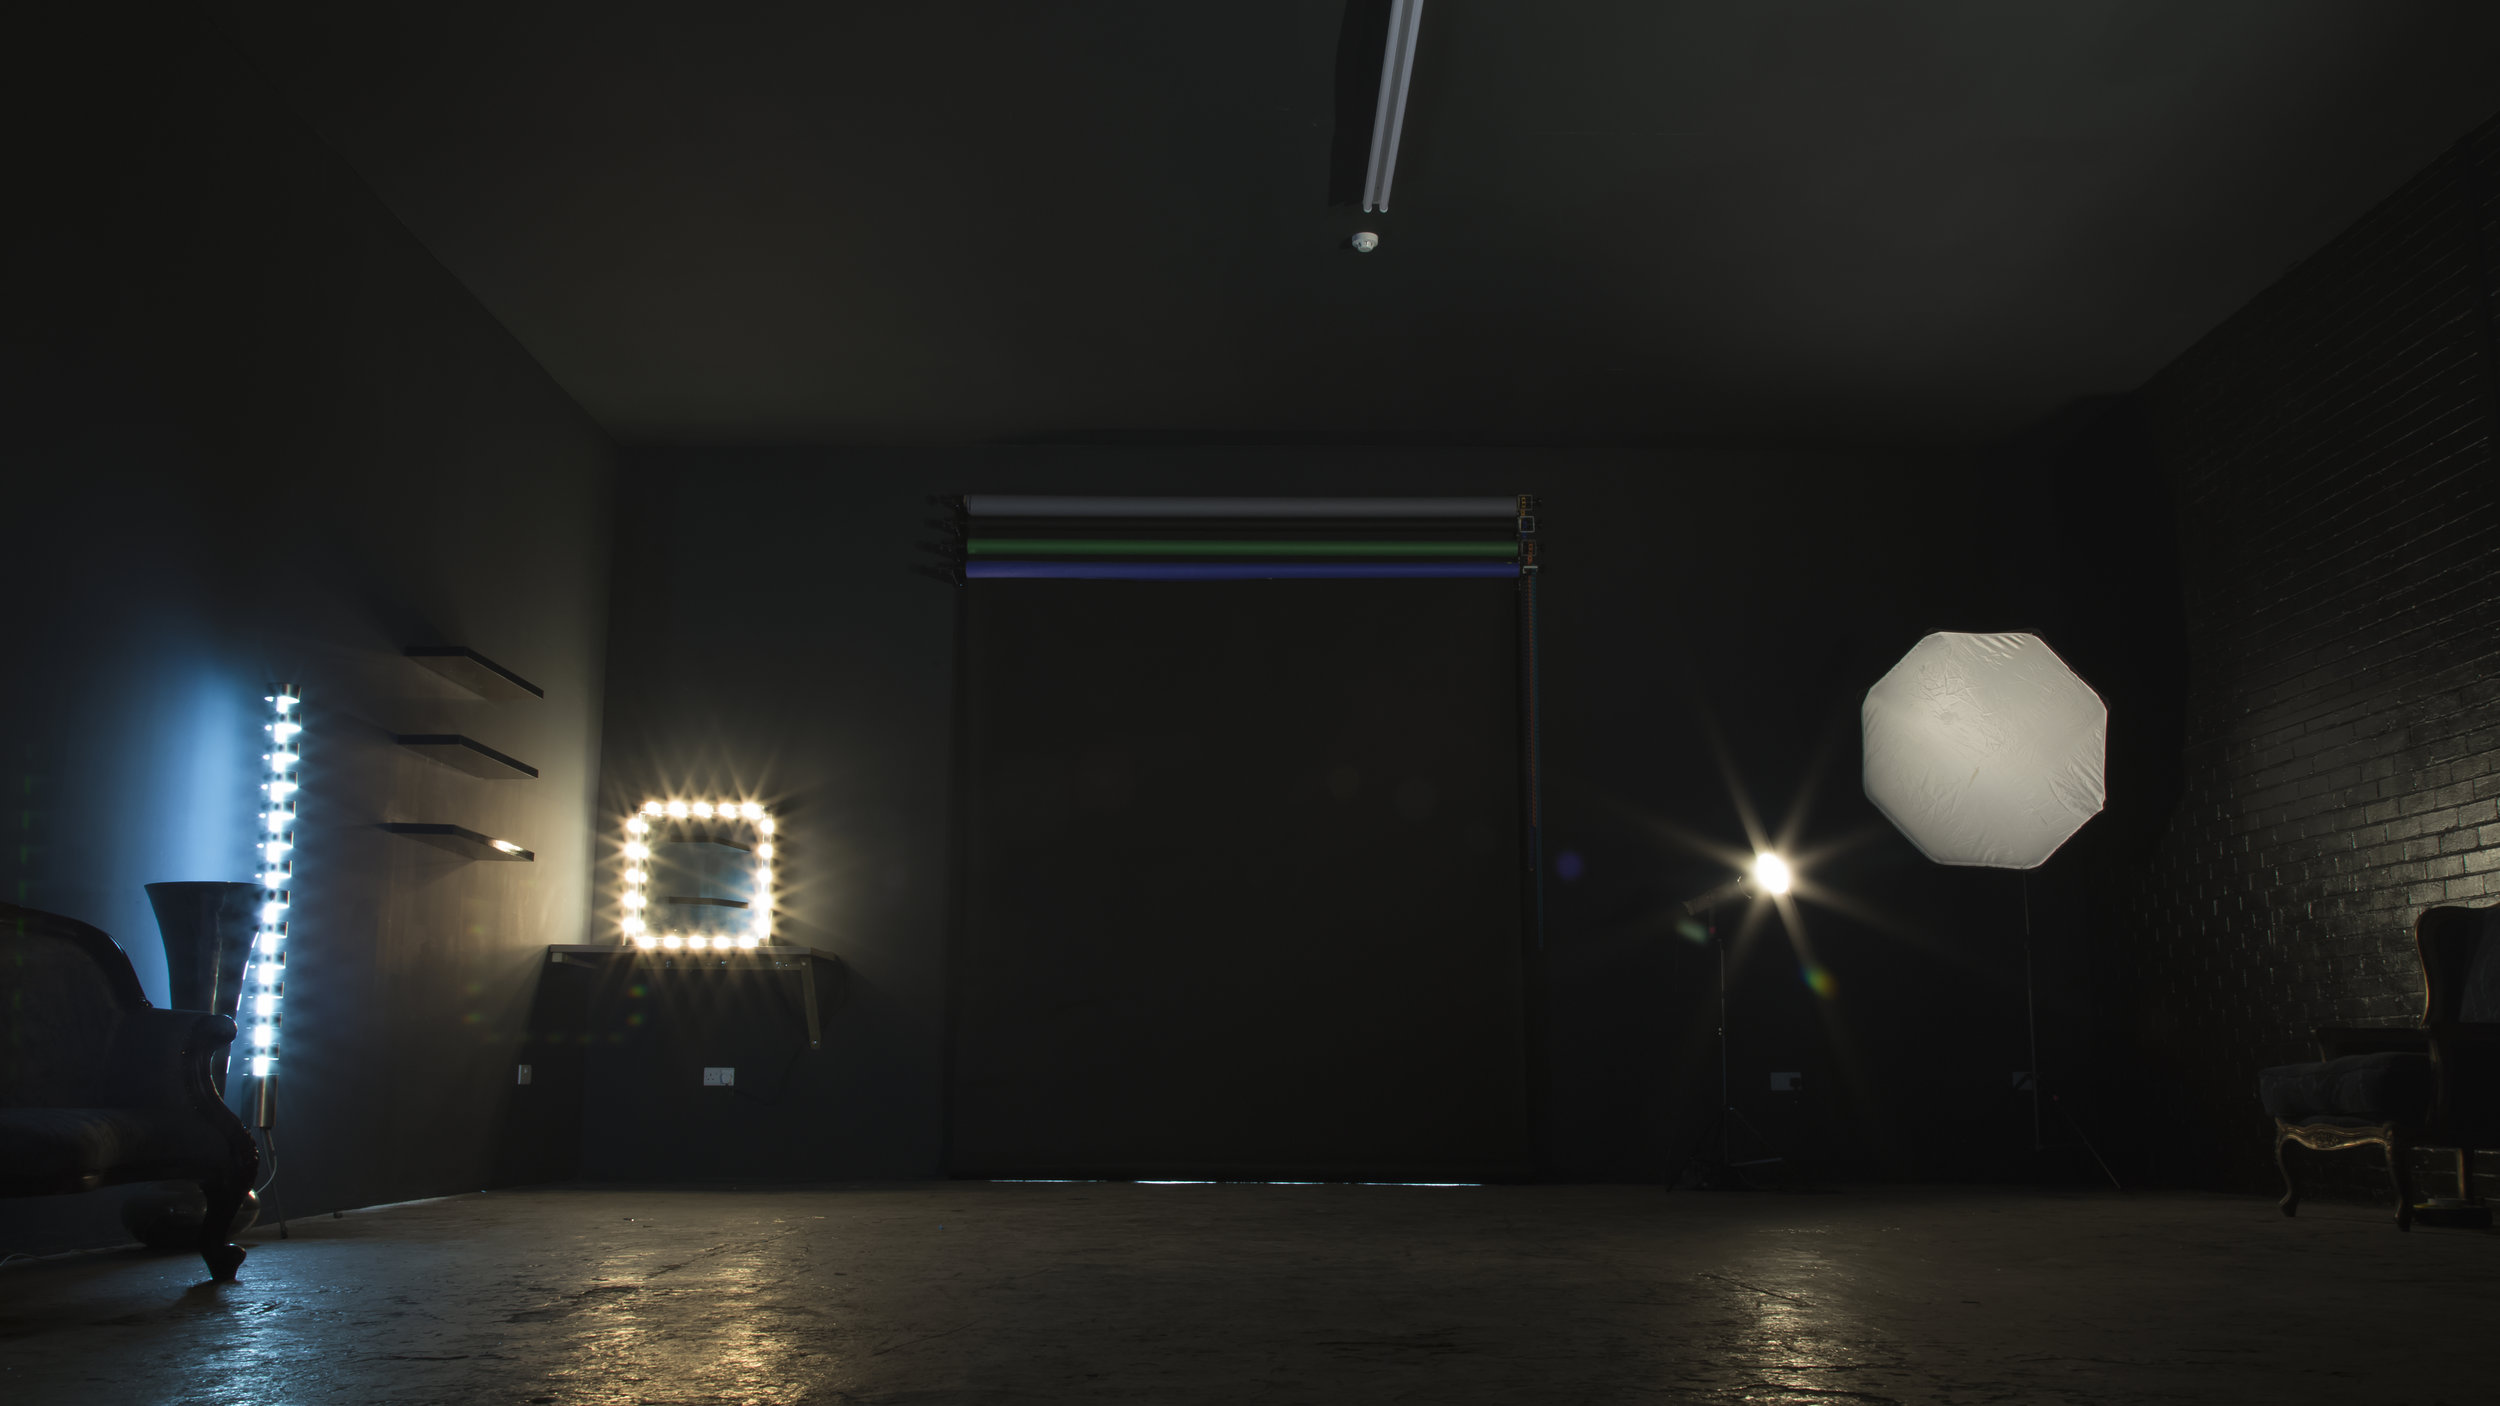 The Blackout Studio